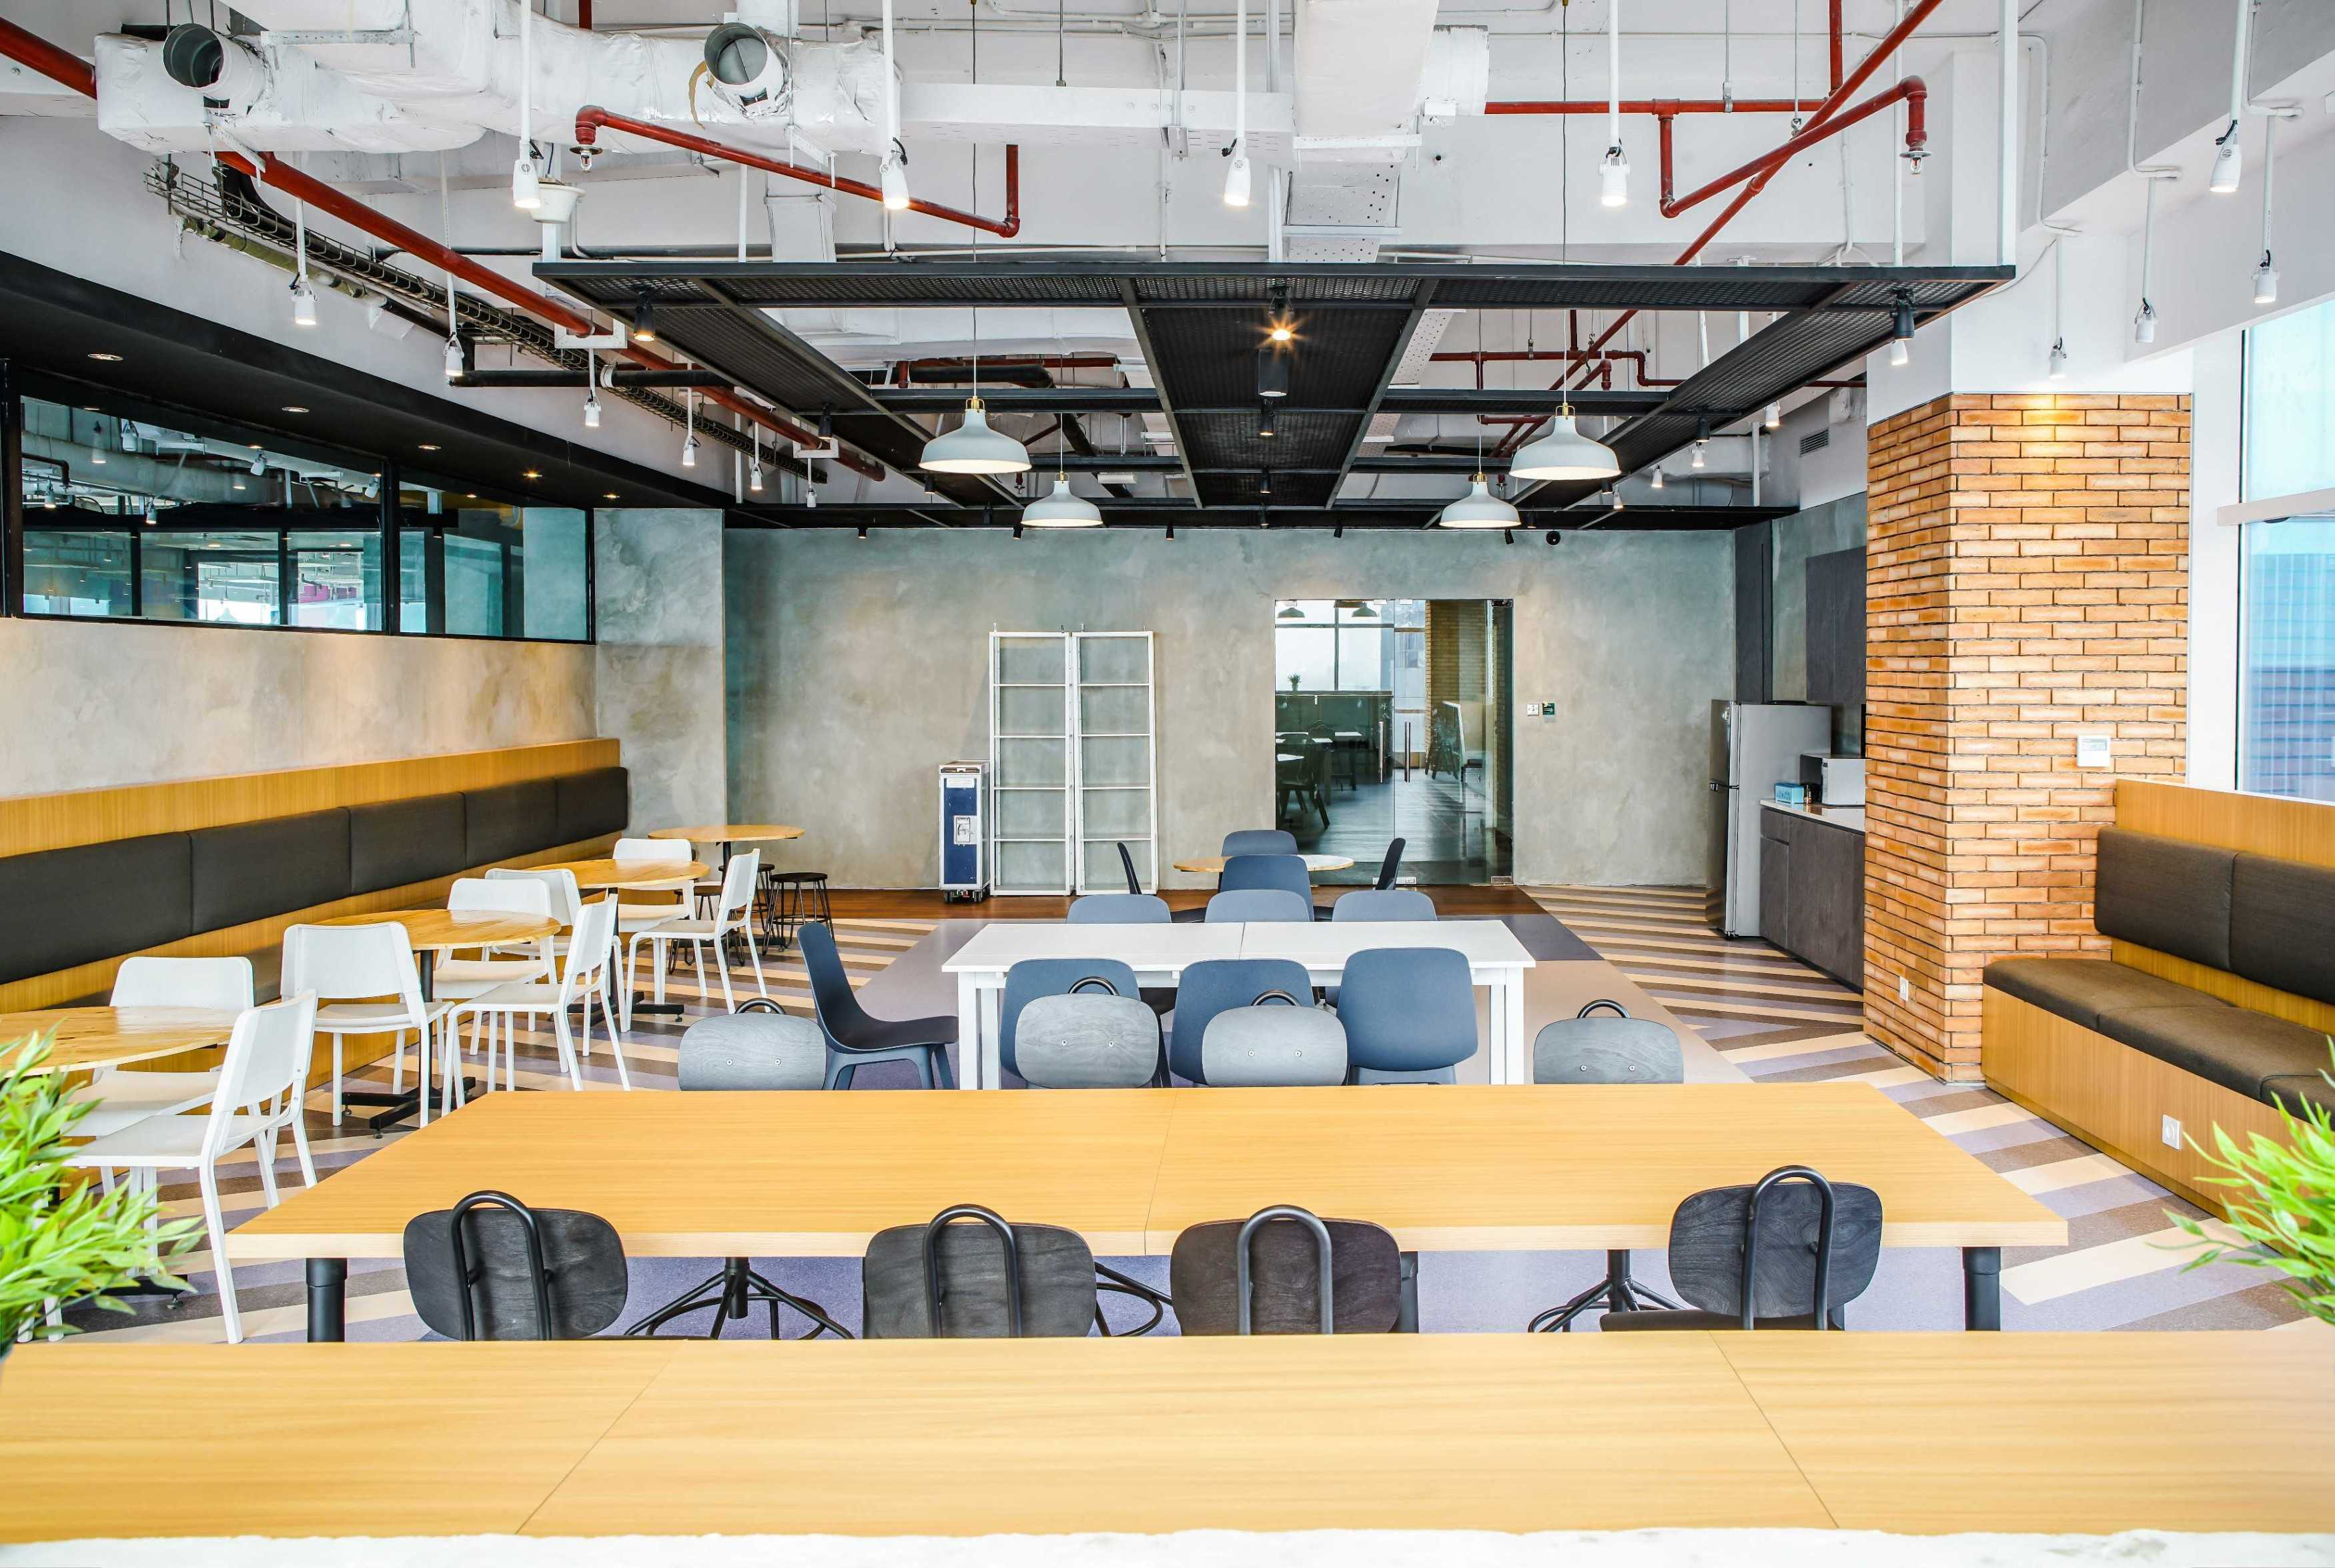 Design Intervention Tech Company Floor 19 Jakarta, Daerah Khusus Ibukota Jakarta, Indonesia Jakarta, Daerah Khusus Ibukota Jakarta, Indonesia Design-Intervention-Traveloka-19Th-Floor   71035